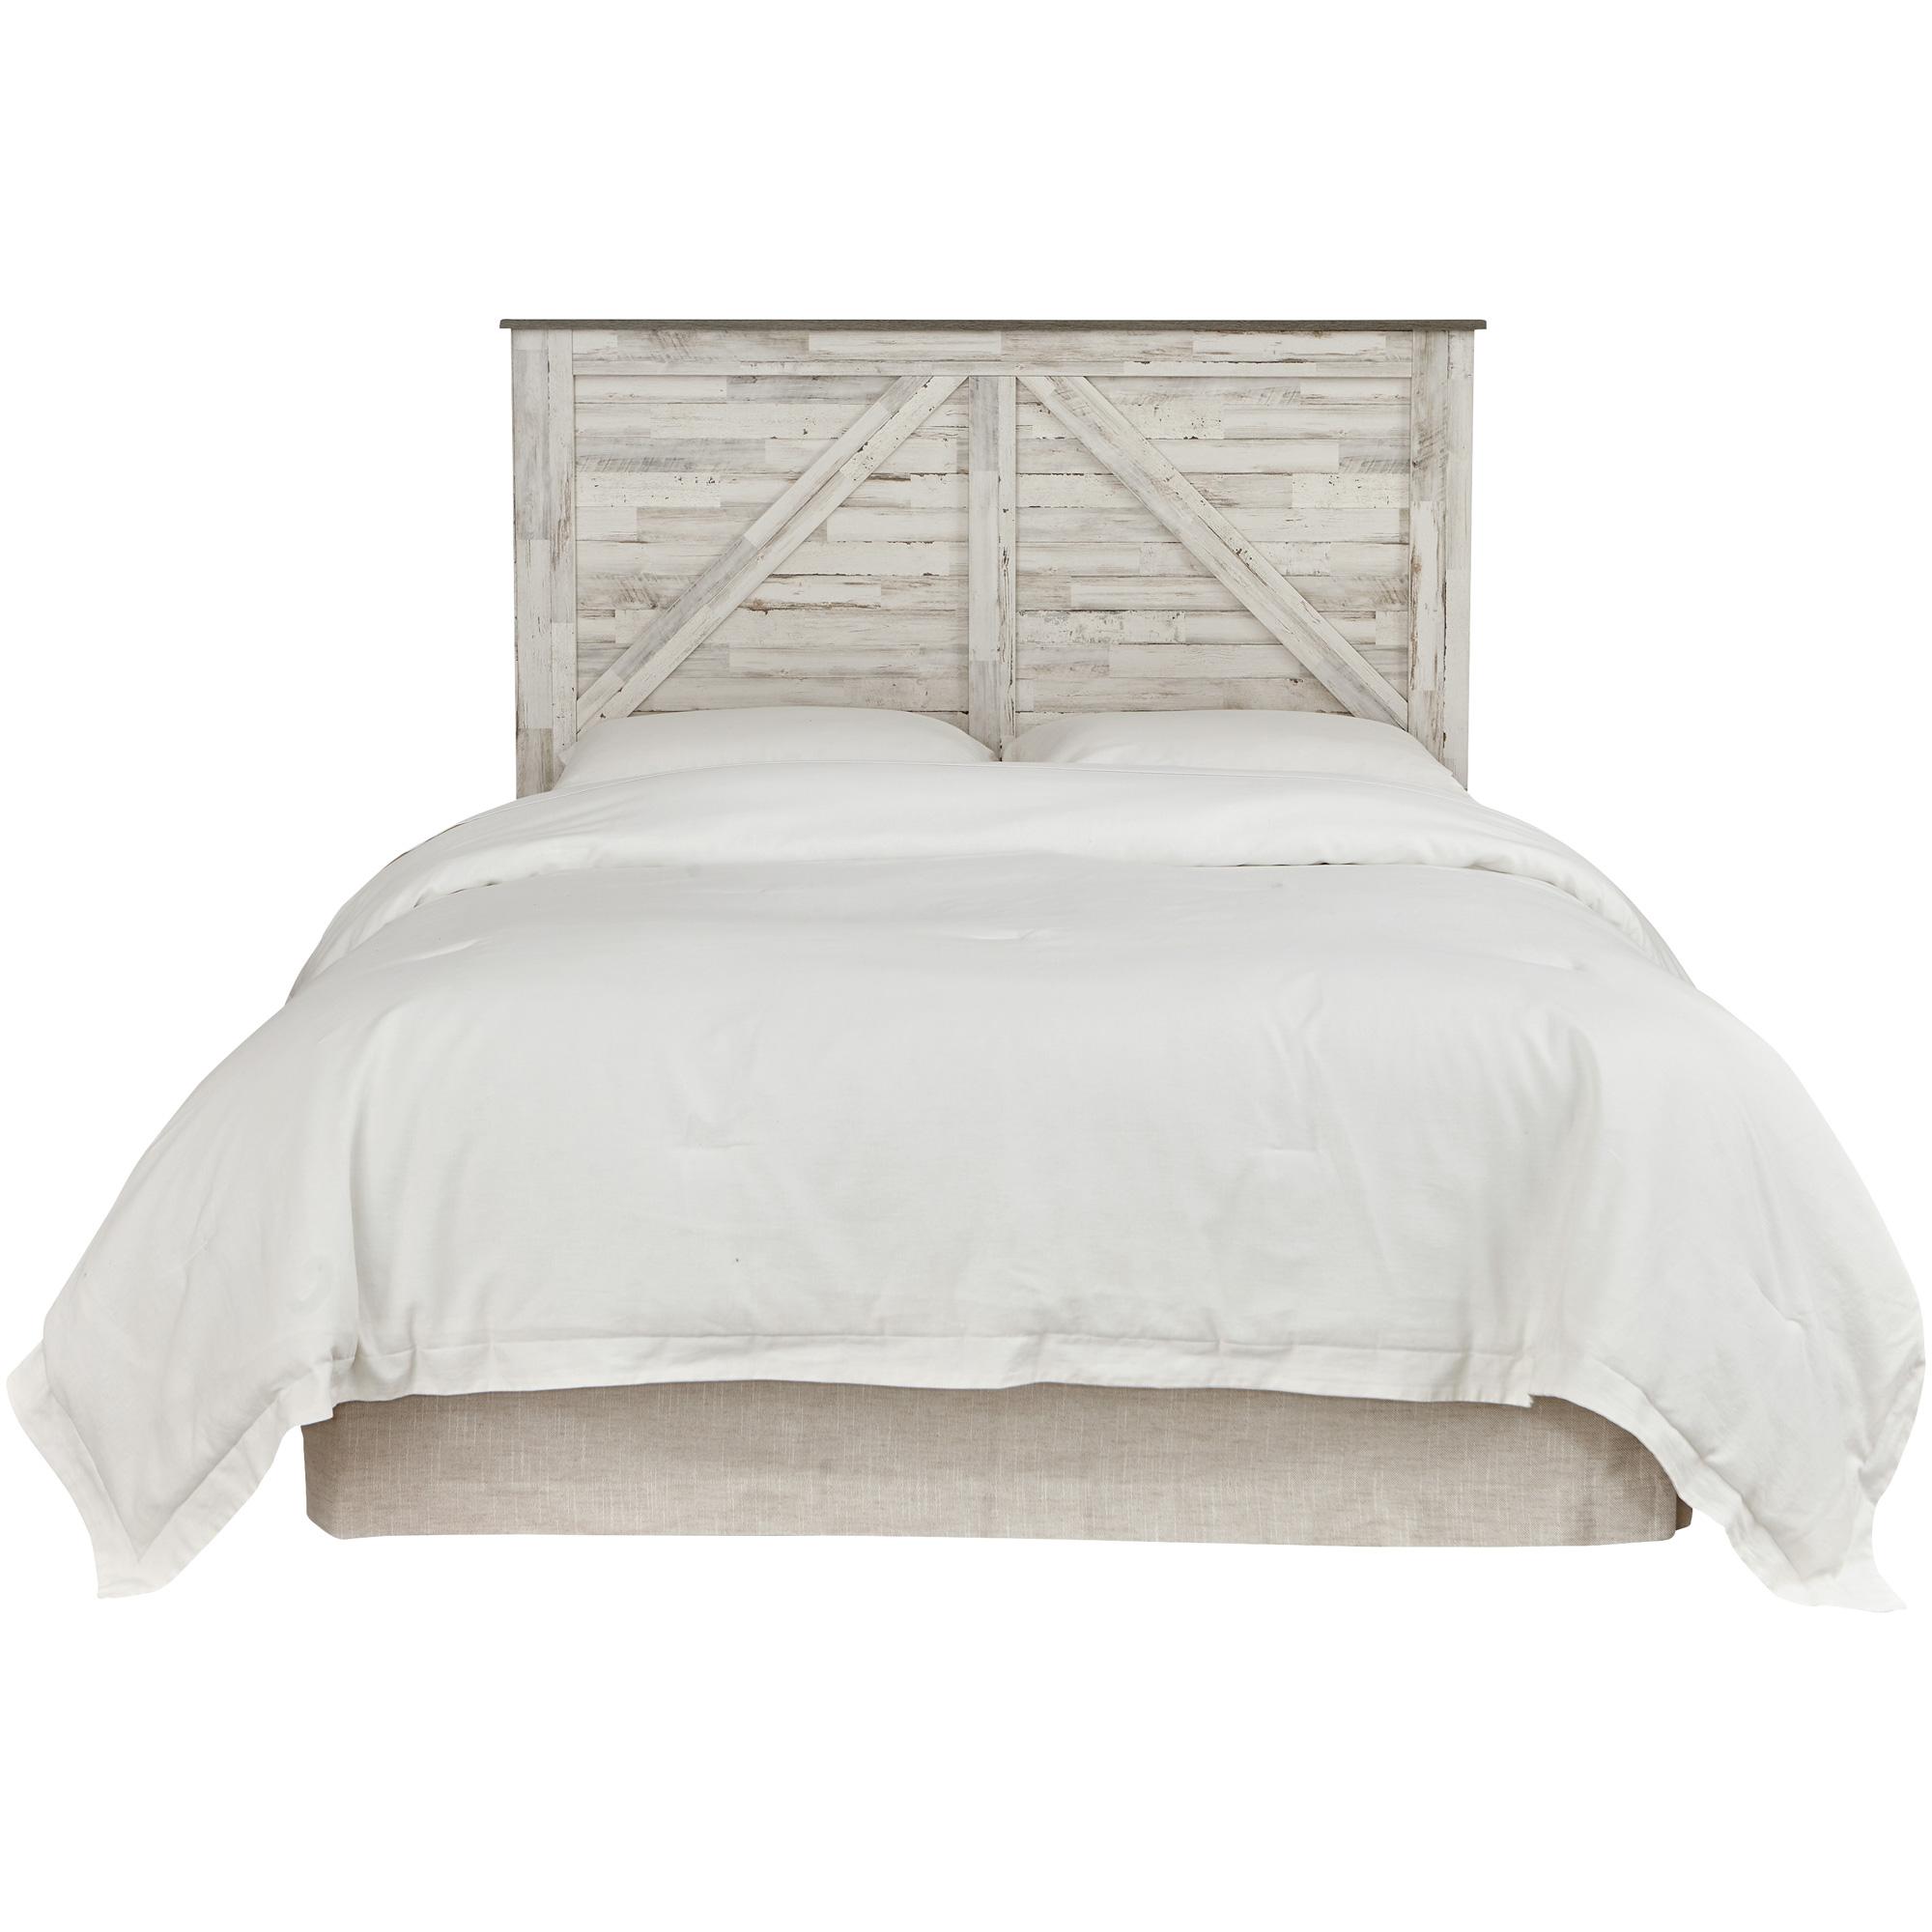 Kith Furniture | Aspen Gray Queen Headboard